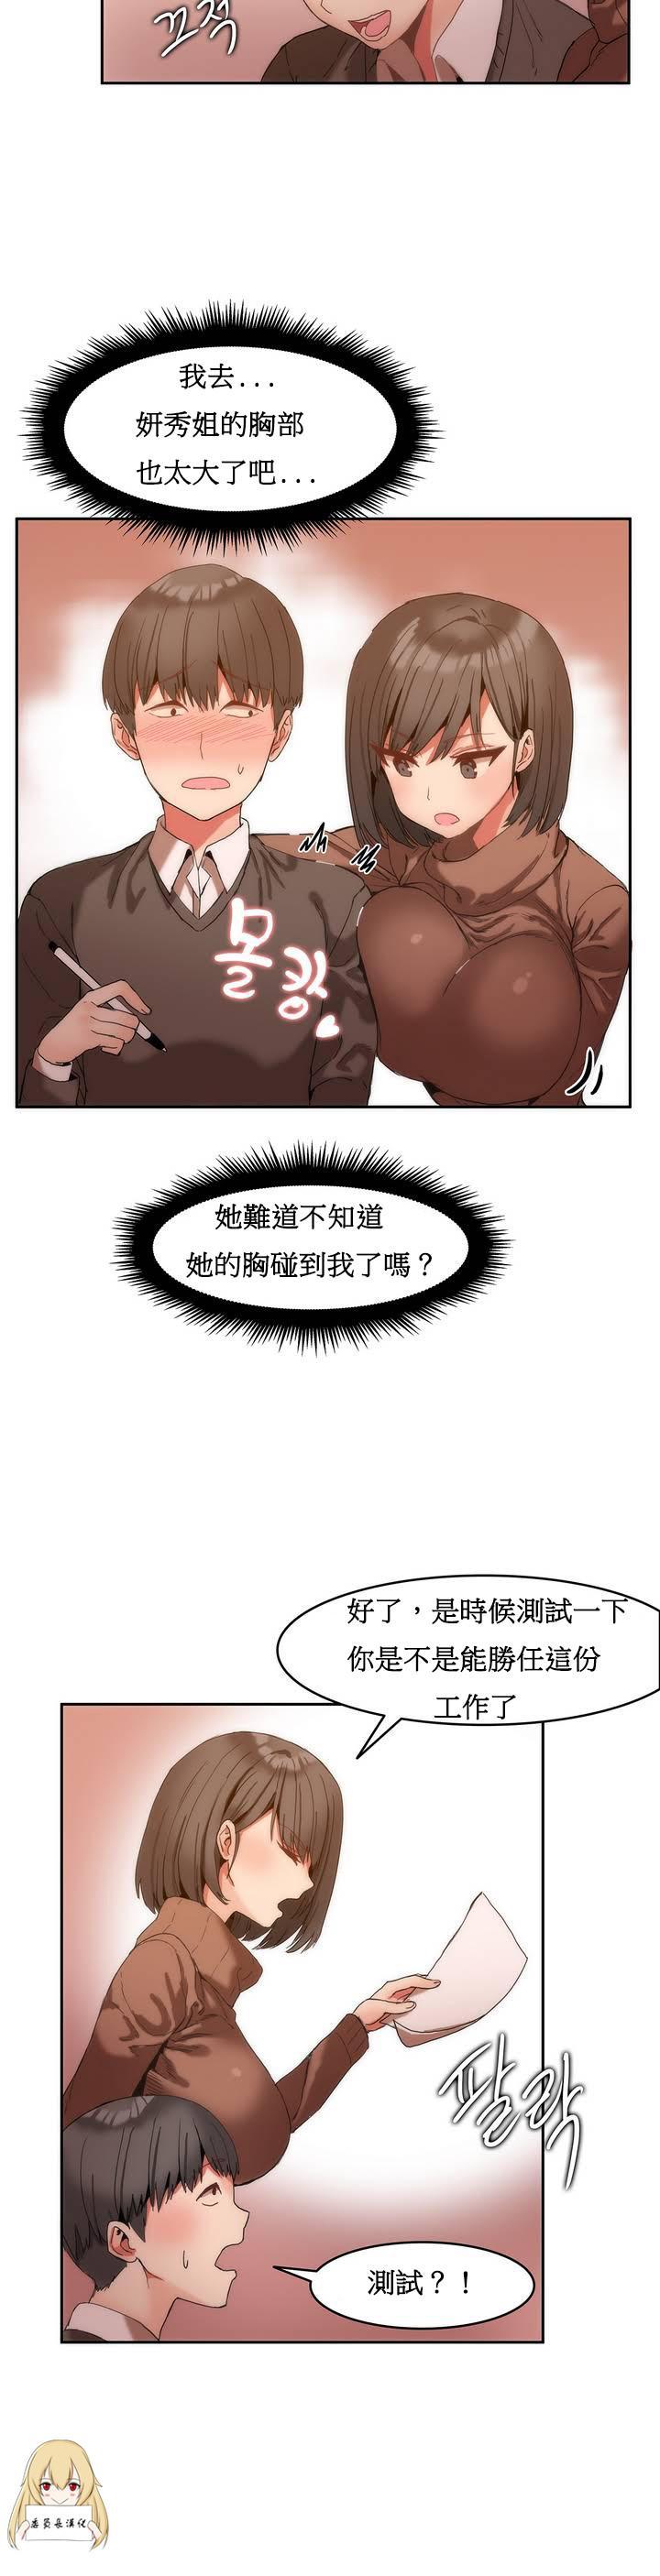 Hahri's Lumpy Boardhouse Ch. 1~16【委員長個人漢化】(持續更新) 20